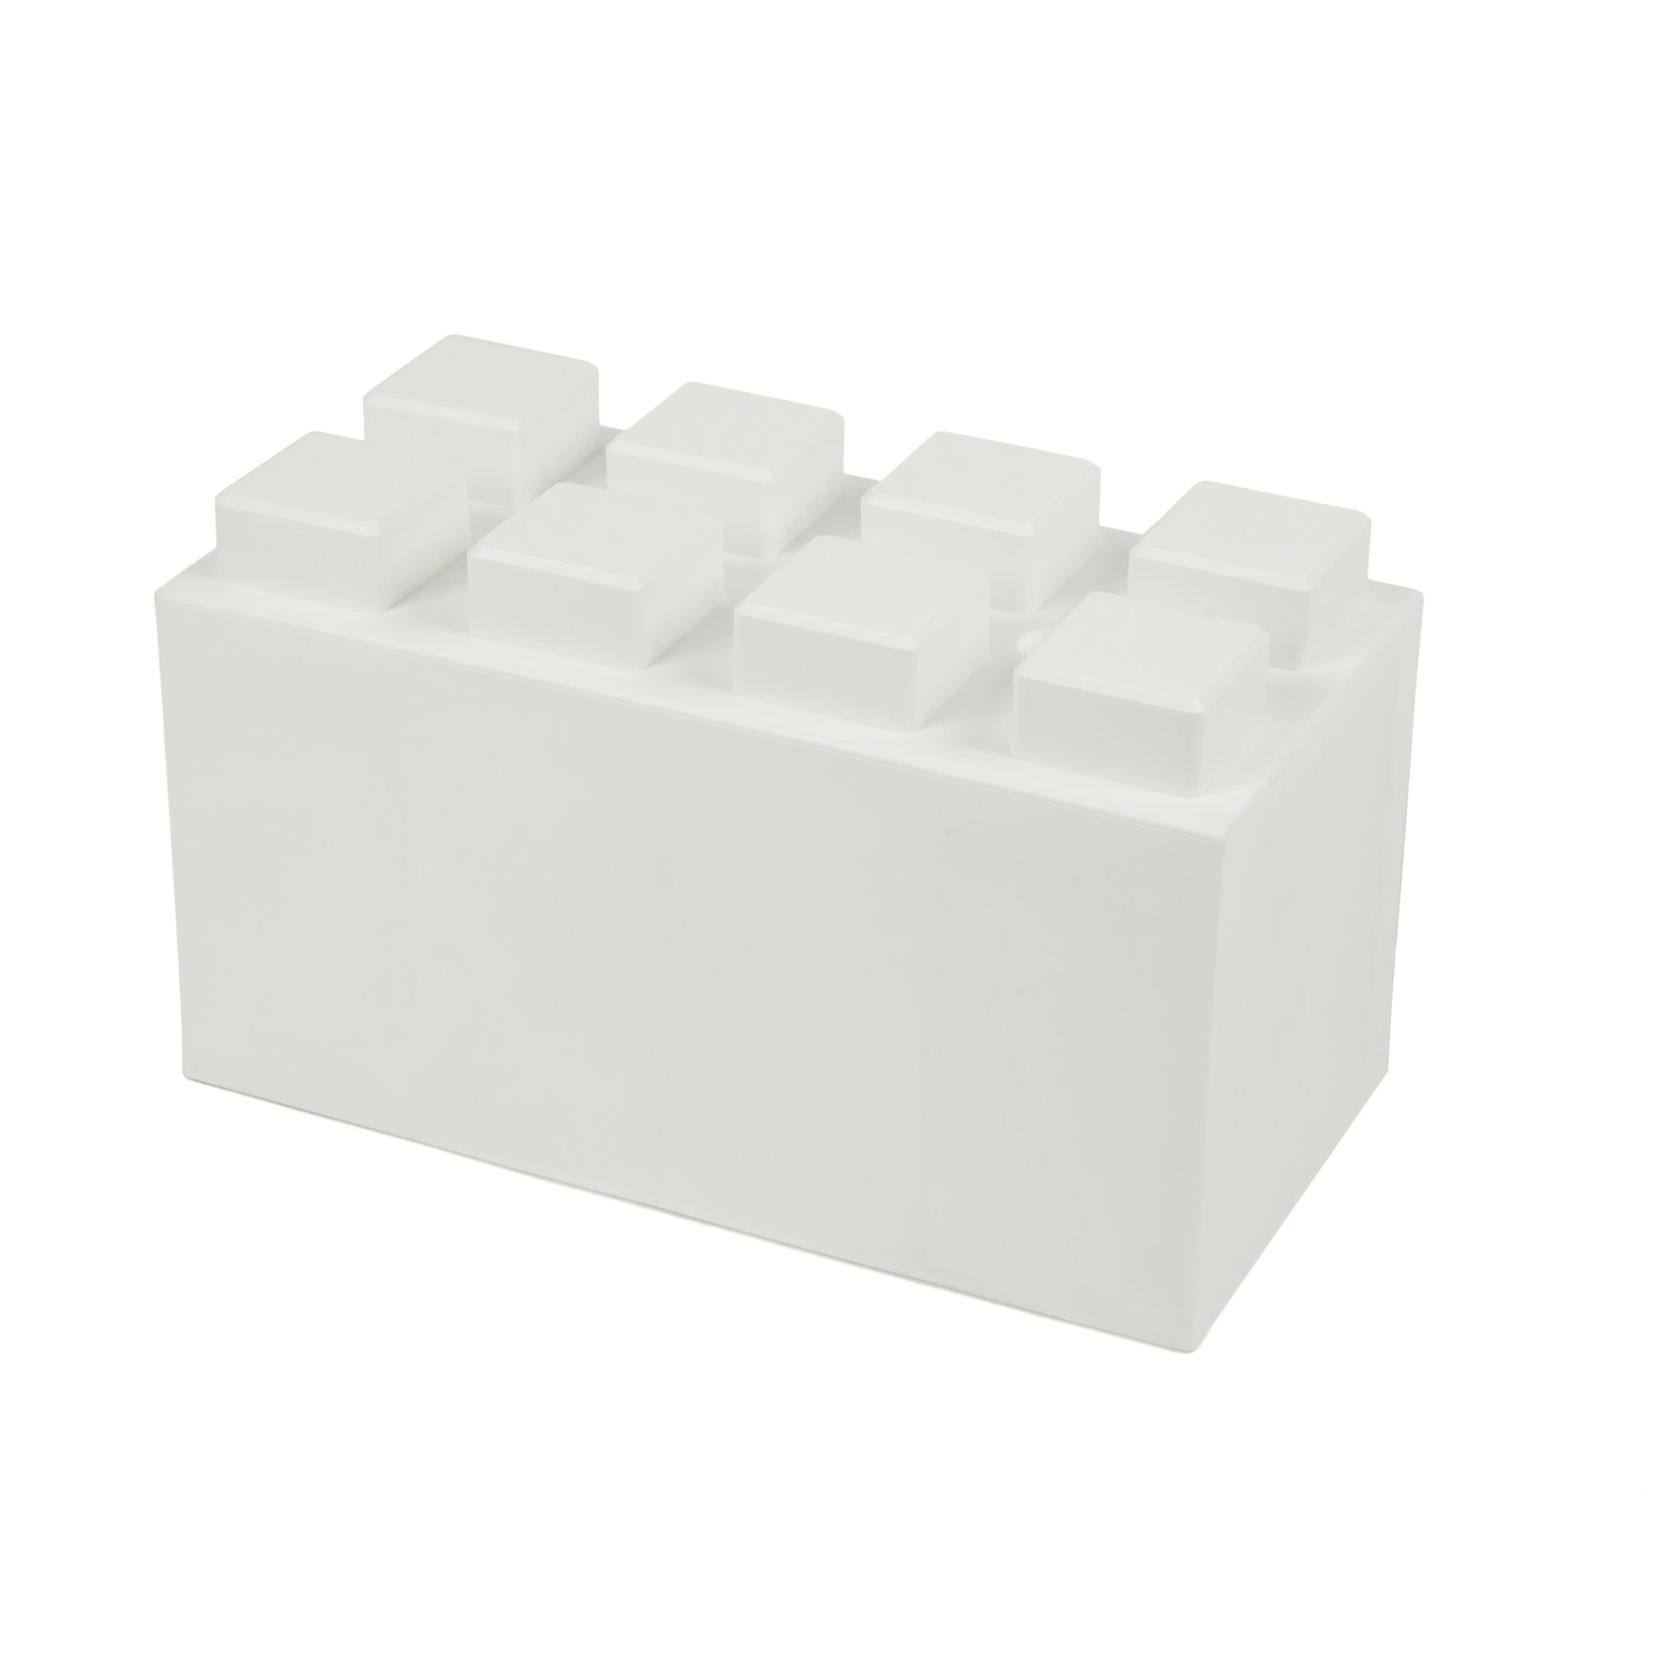 EverBlock Full Block White